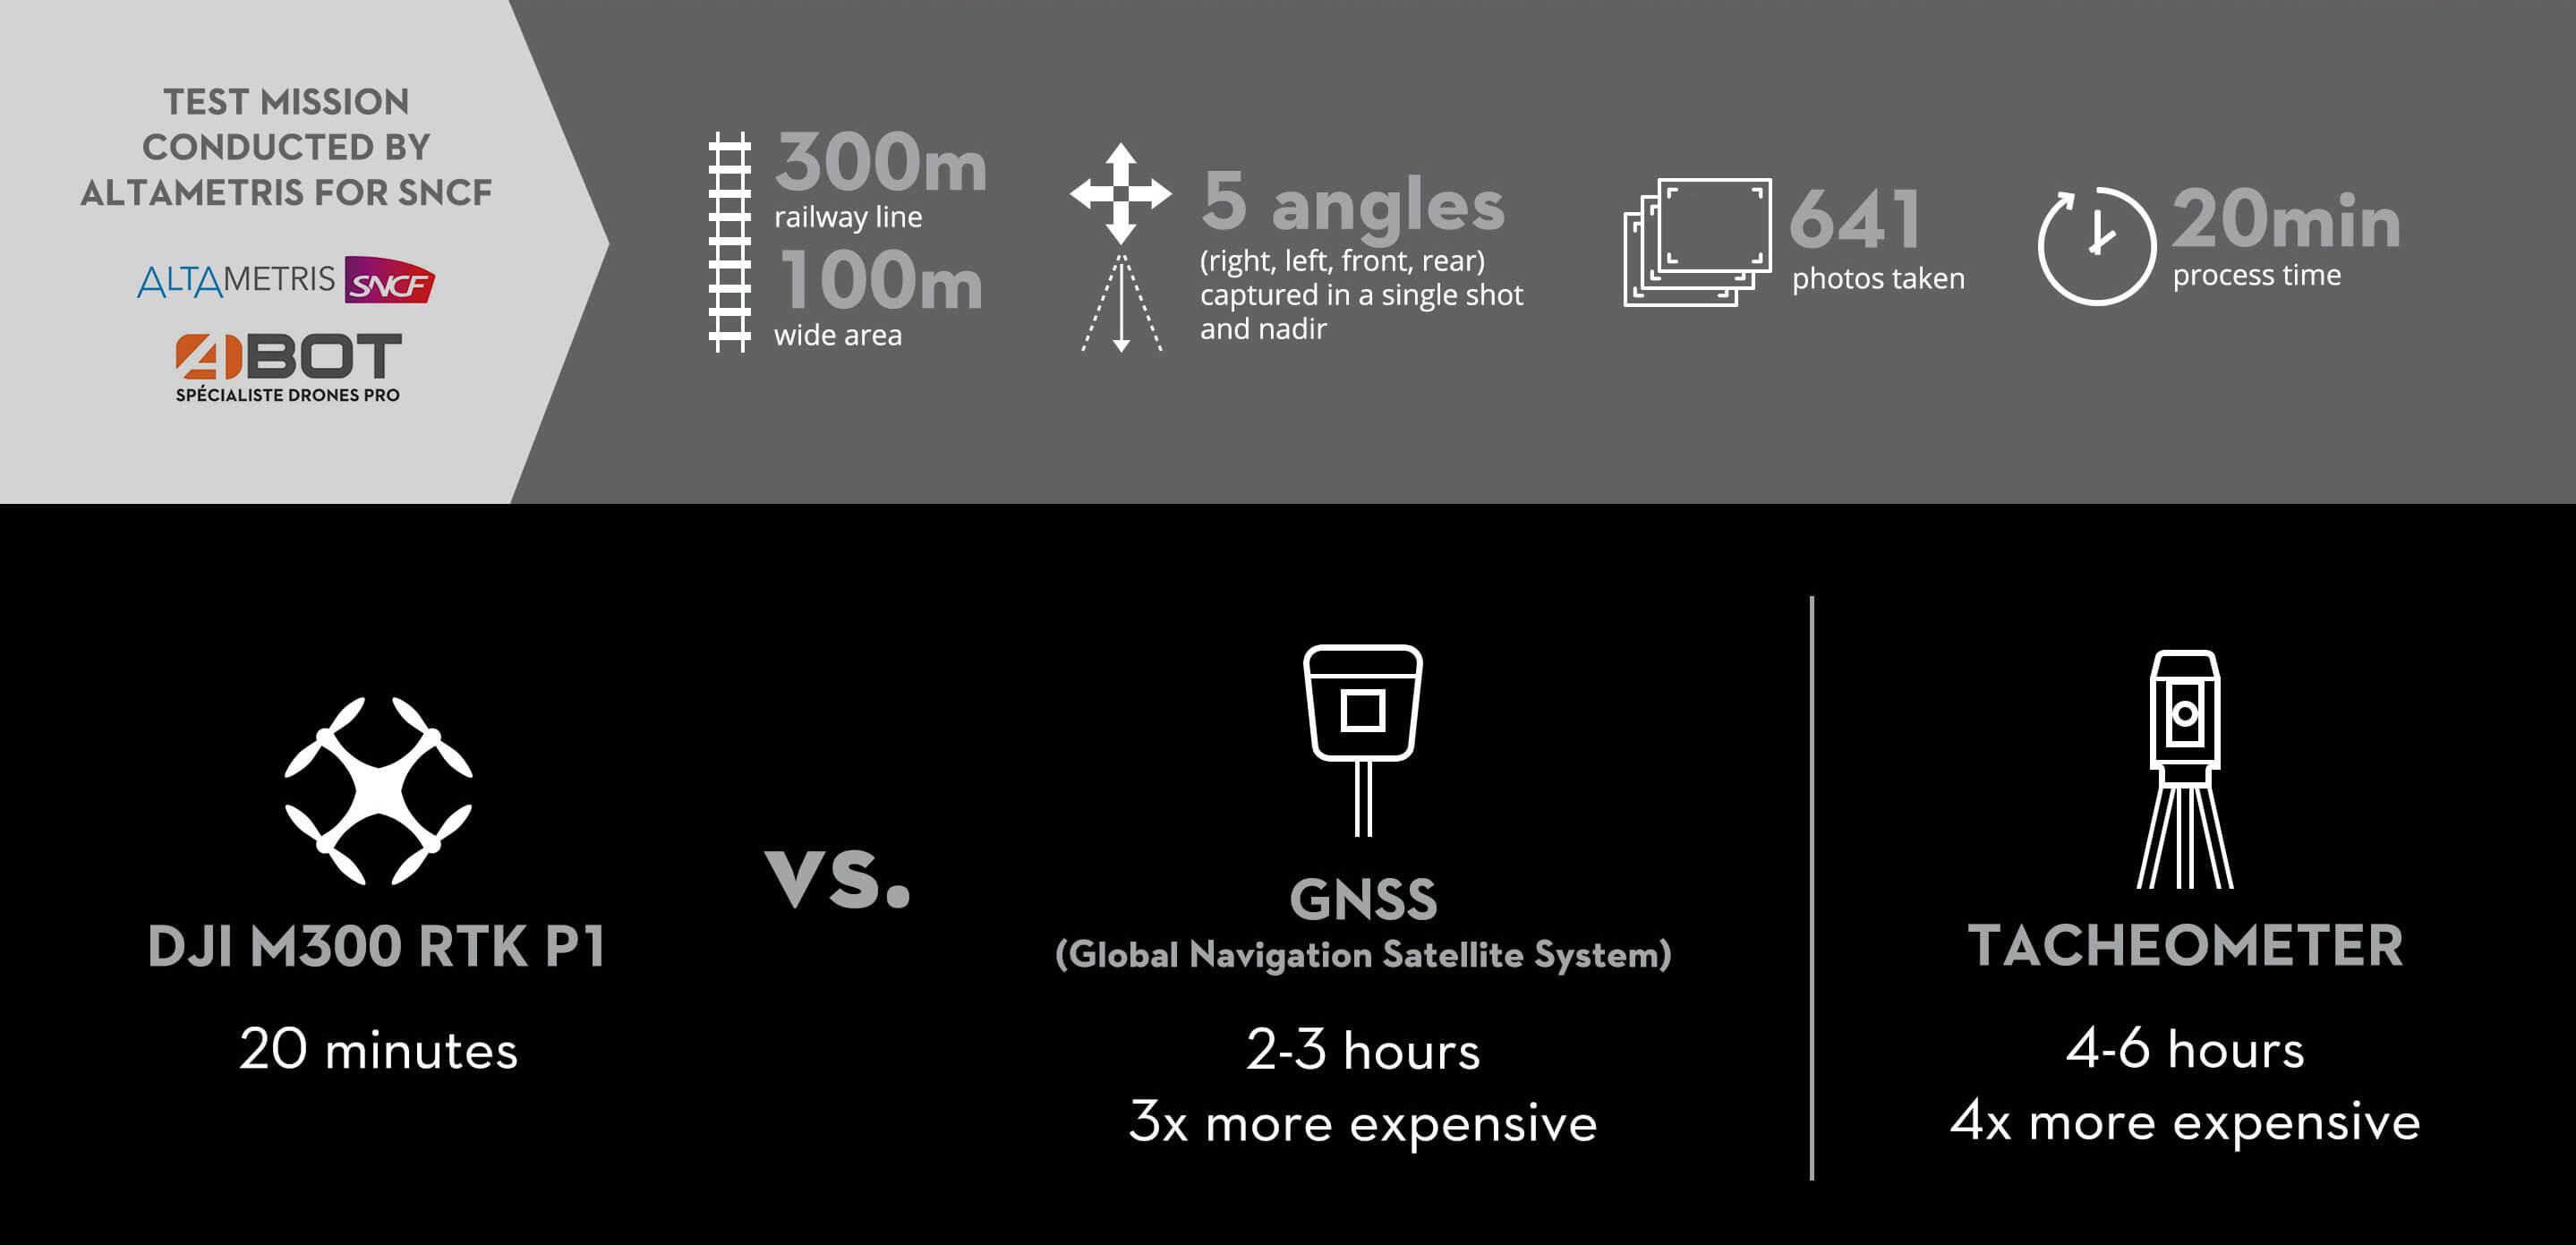 Altametris DJI Infographic 1